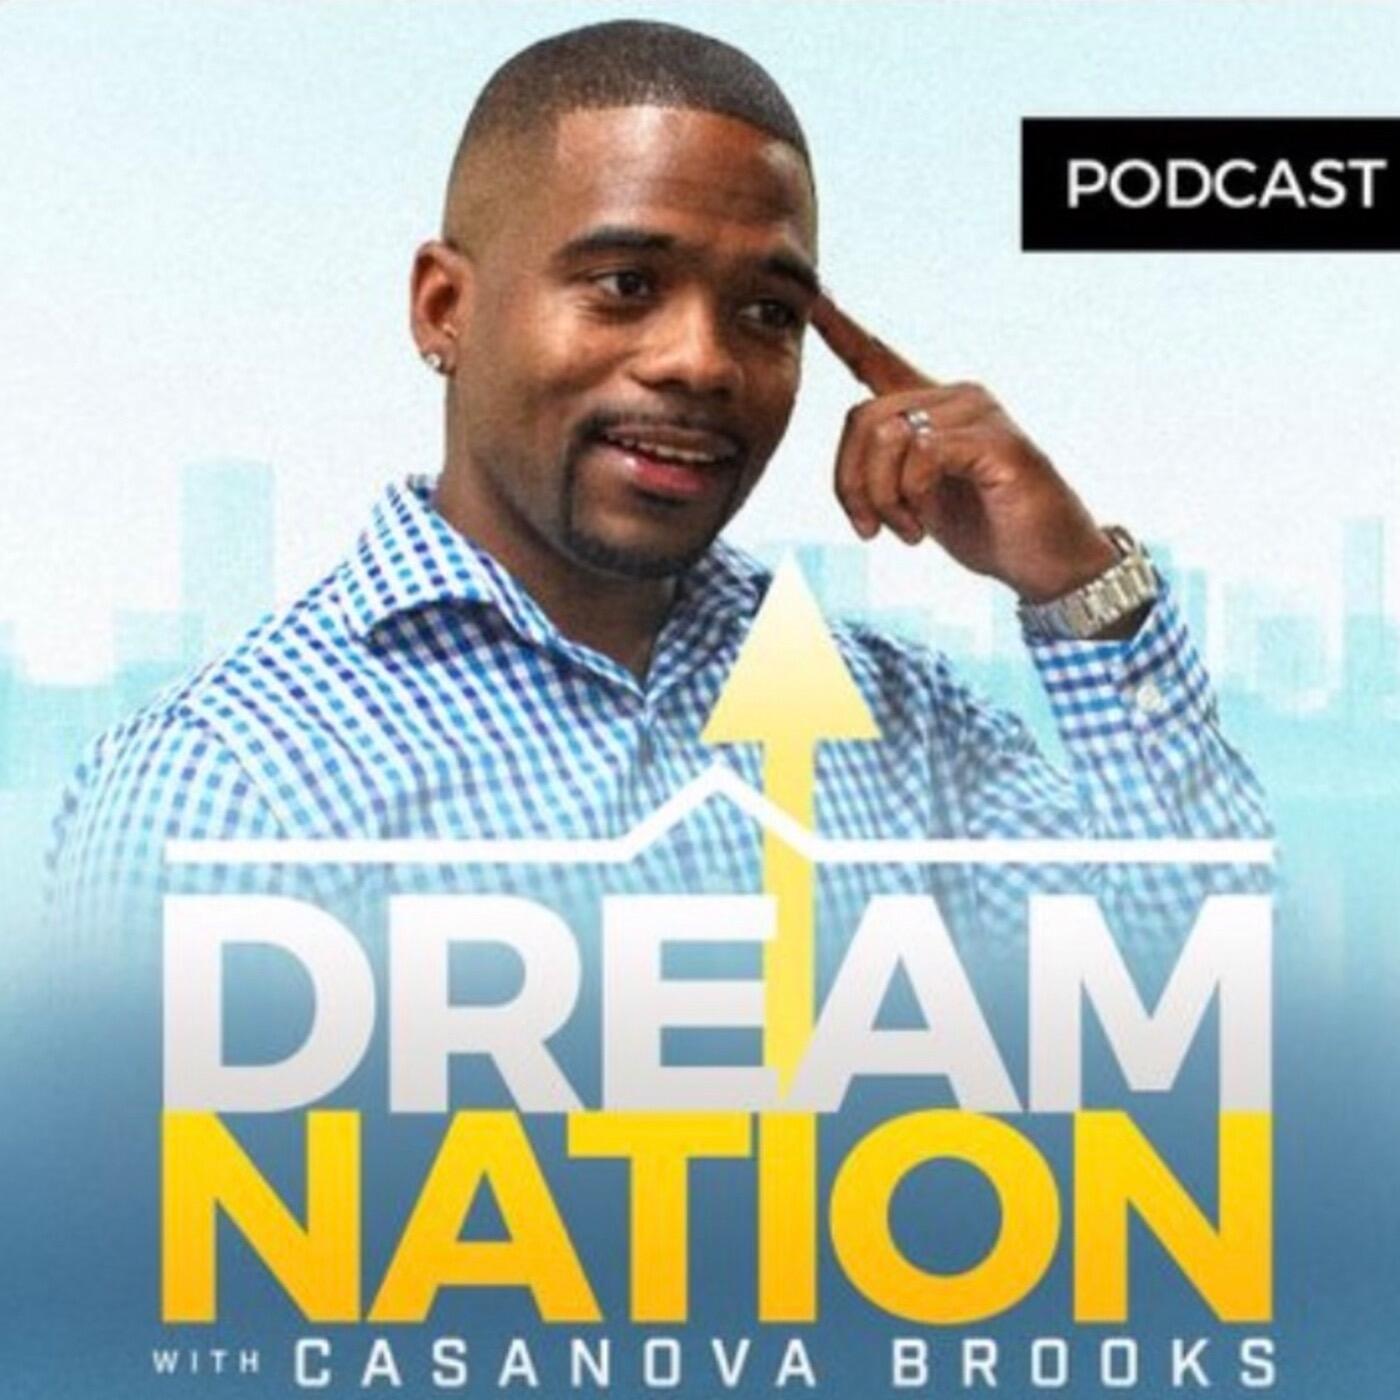 The DreamNation Podcast With Casanova Brooks